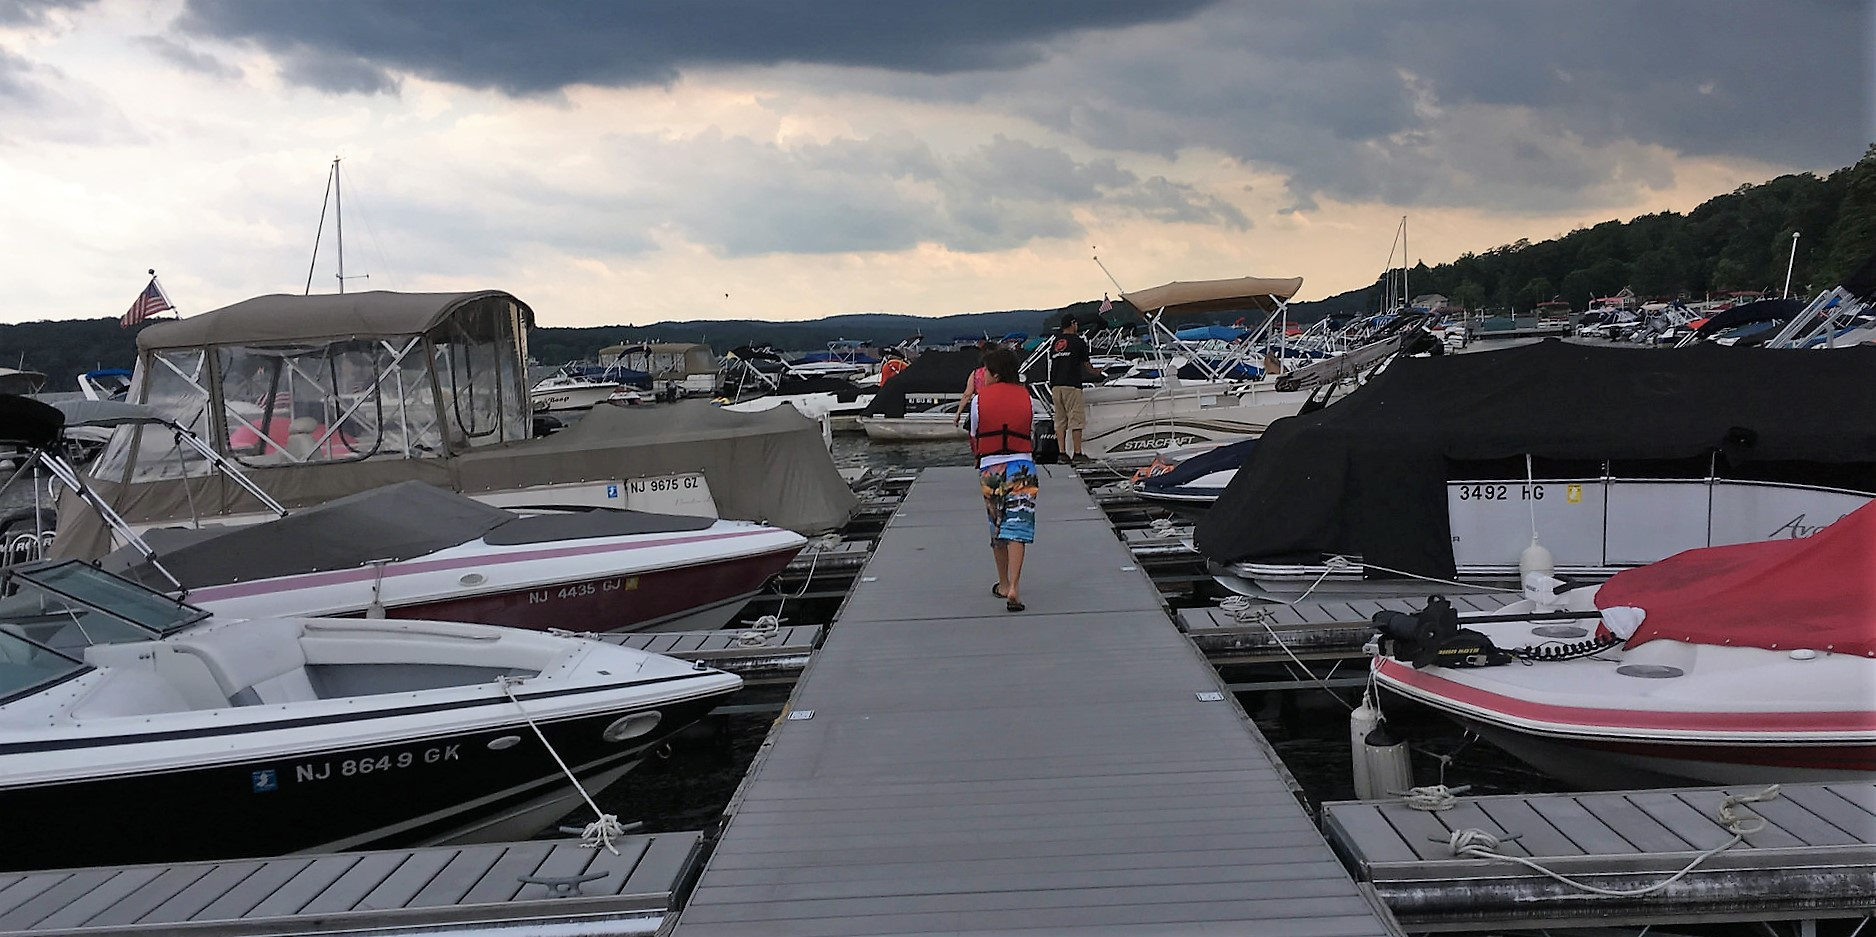 Family Reunion on Greenwood Lake pier, boat rental